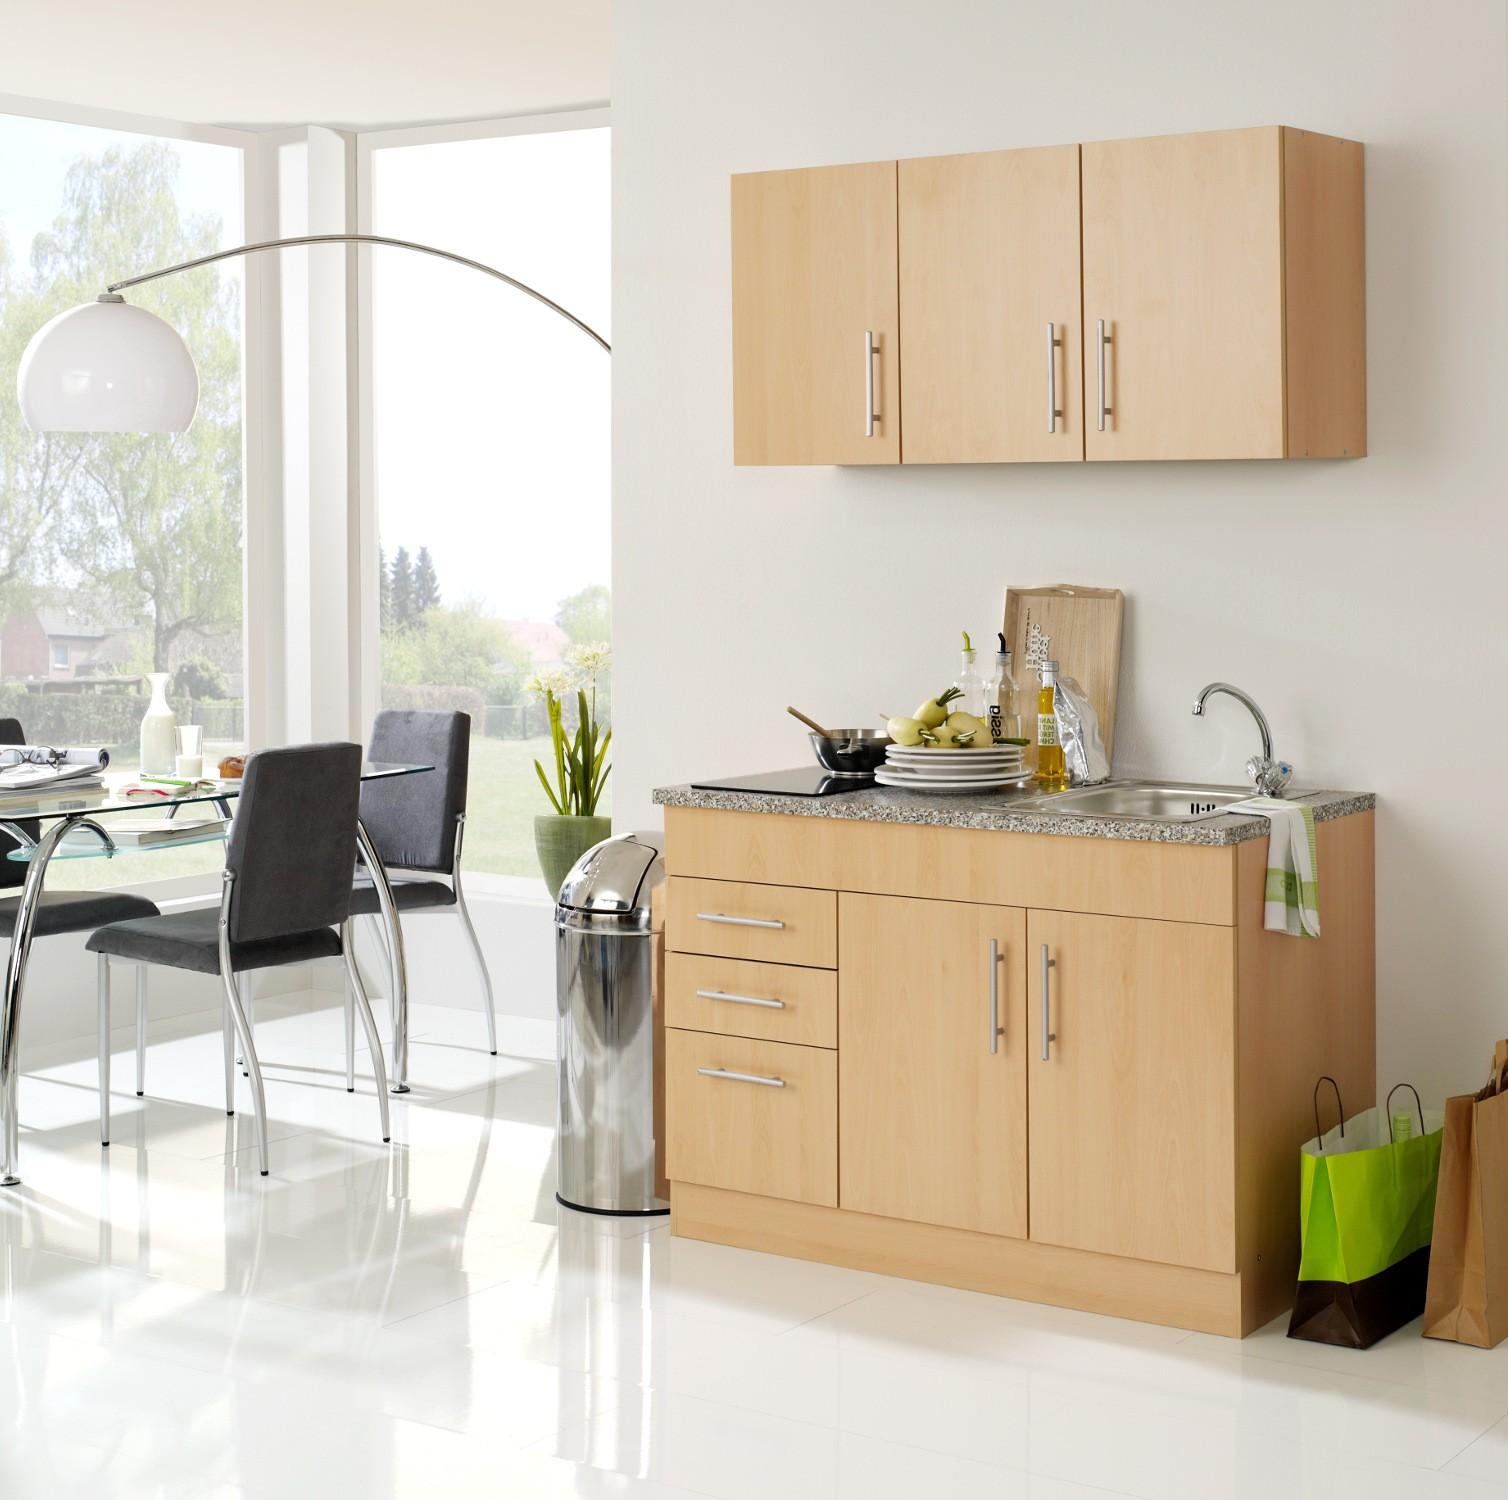 neu singlek che berlin mit glaskeramikkochfeld minik che 120cm b rok che buche porta westfalica. Black Bedroom Furniture Sets. Home Design Ideas